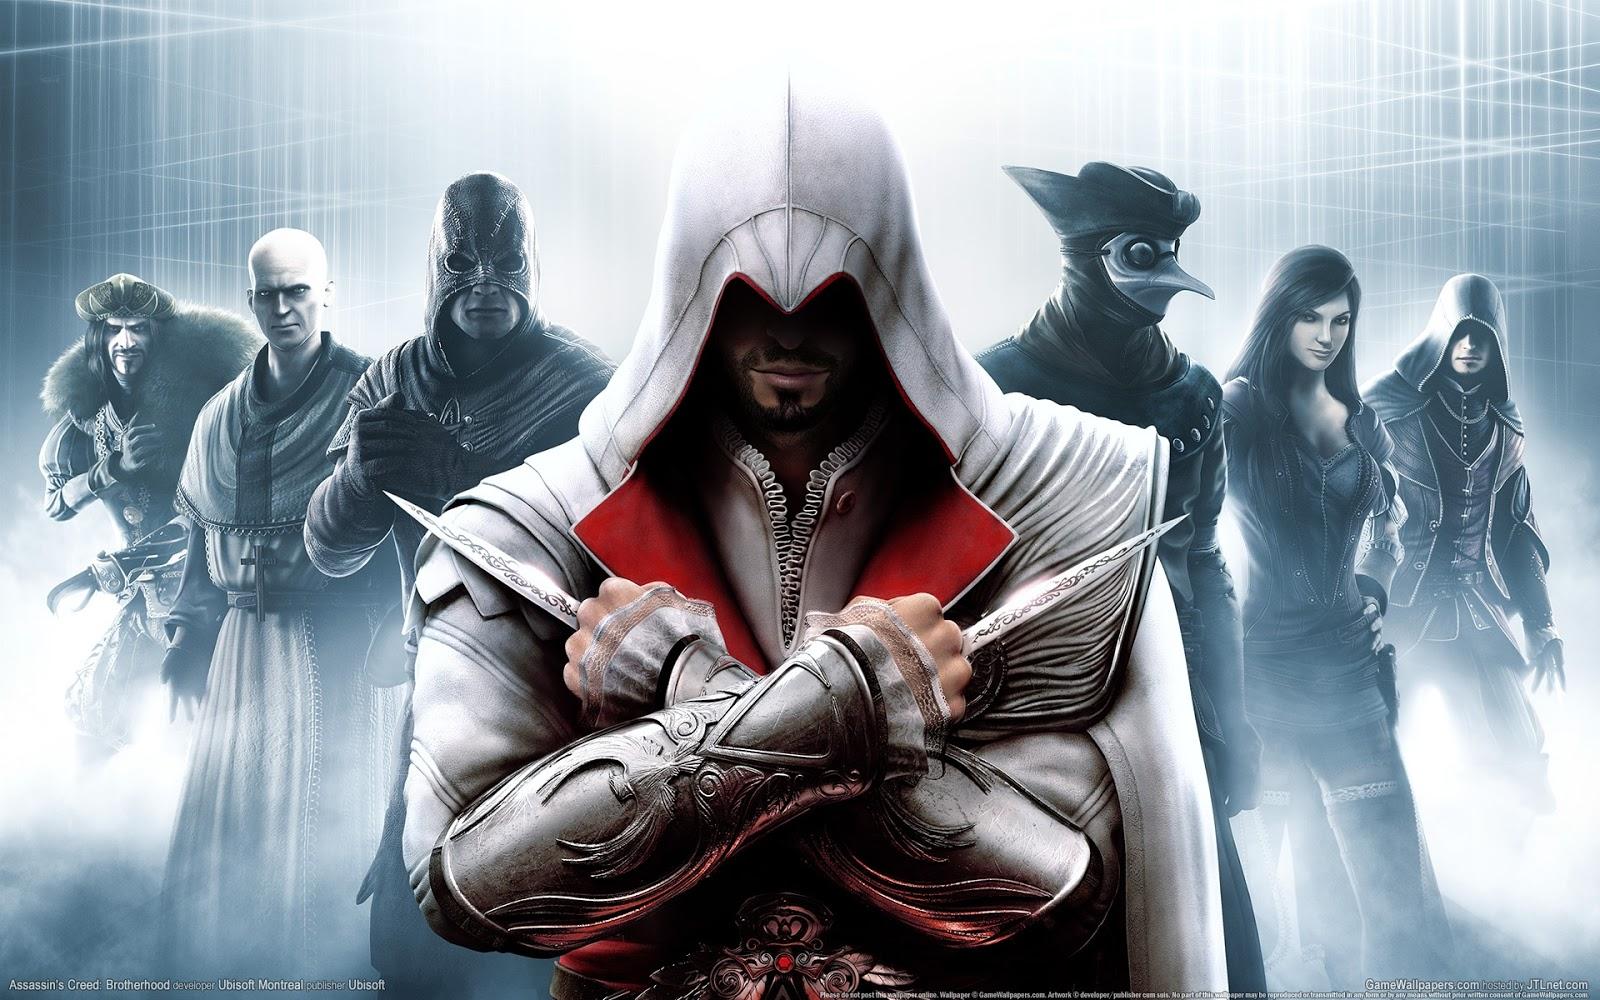 http://2.bp.blogspot.com/-iRwKMWHaiCw/UOwxihb7XzI/AAAAAAAAGpw/sW-M1IwvLBI/s1600/wallpaper_assassins_creed_brotherhood_04_1920x1200.jpg